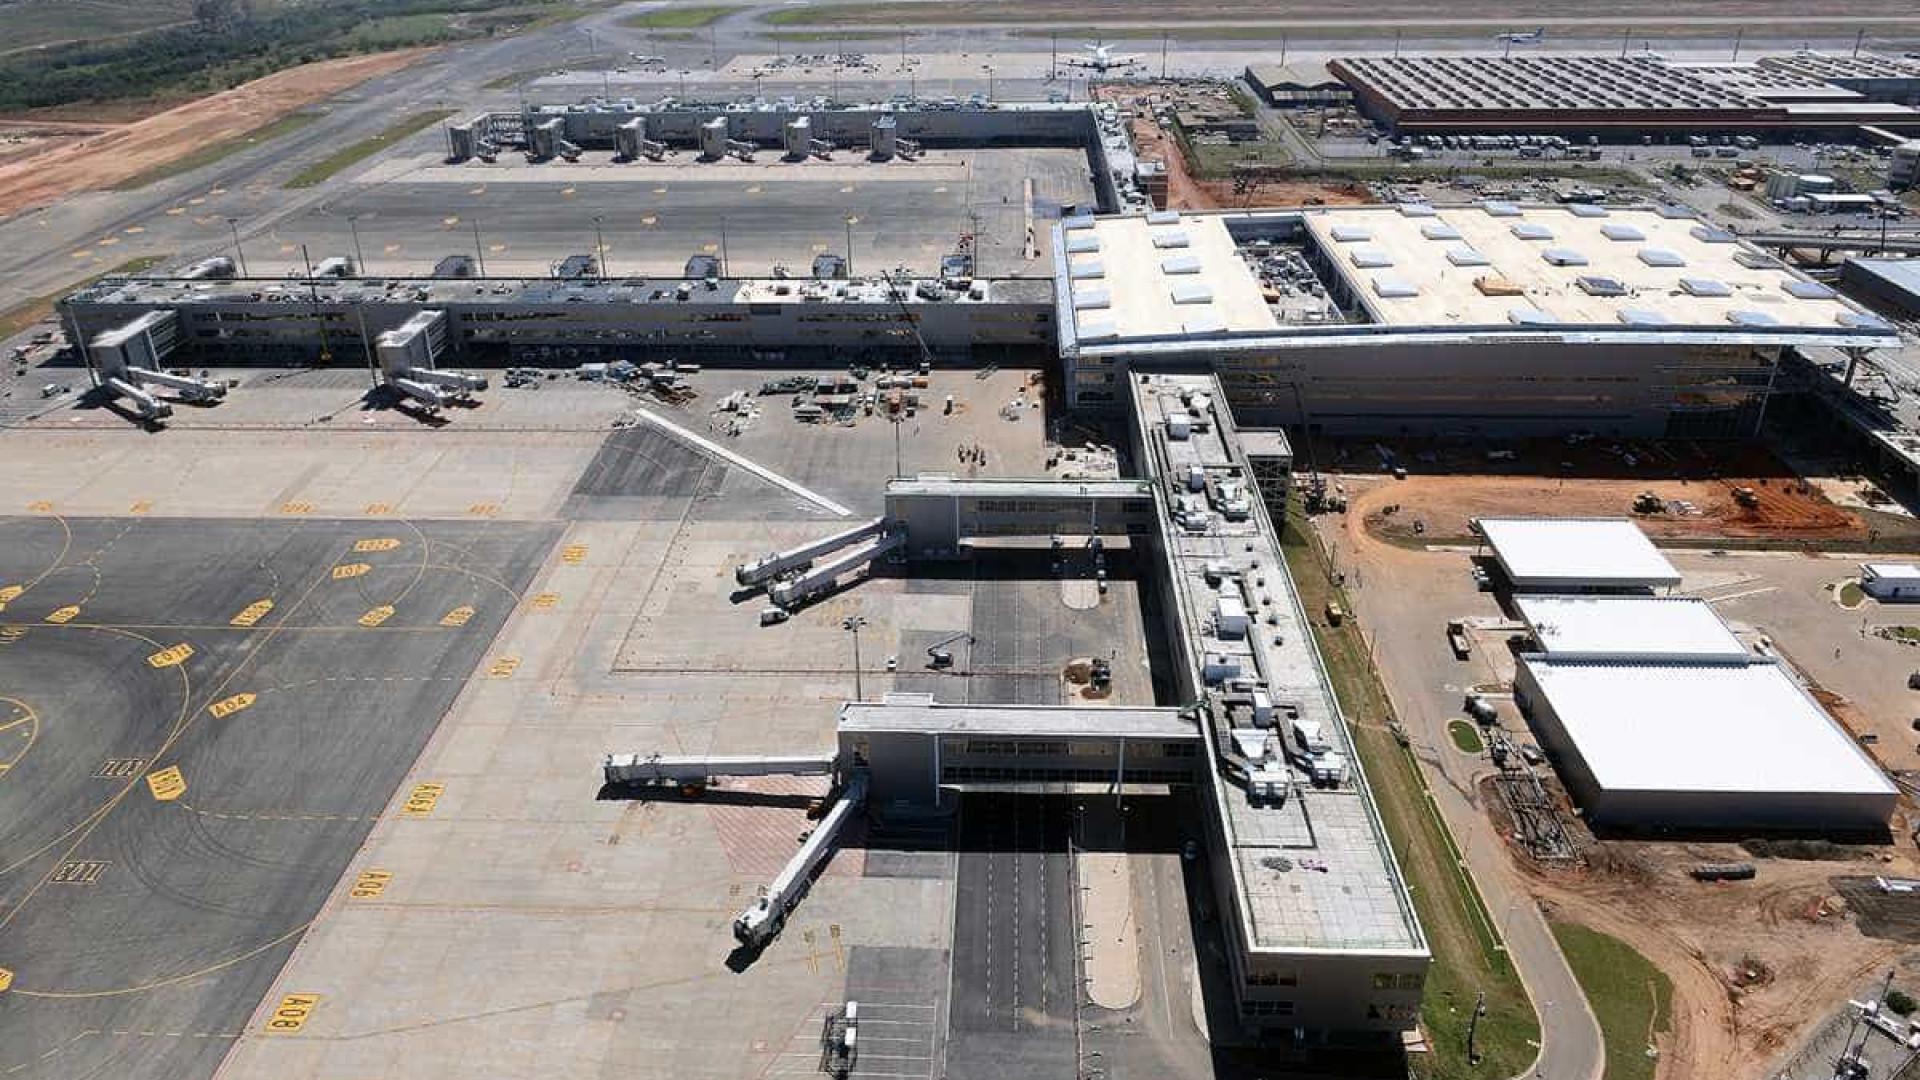 Aeroporto Sp : Notícias ao minuto brasil grupo invade pista e rouba carga no